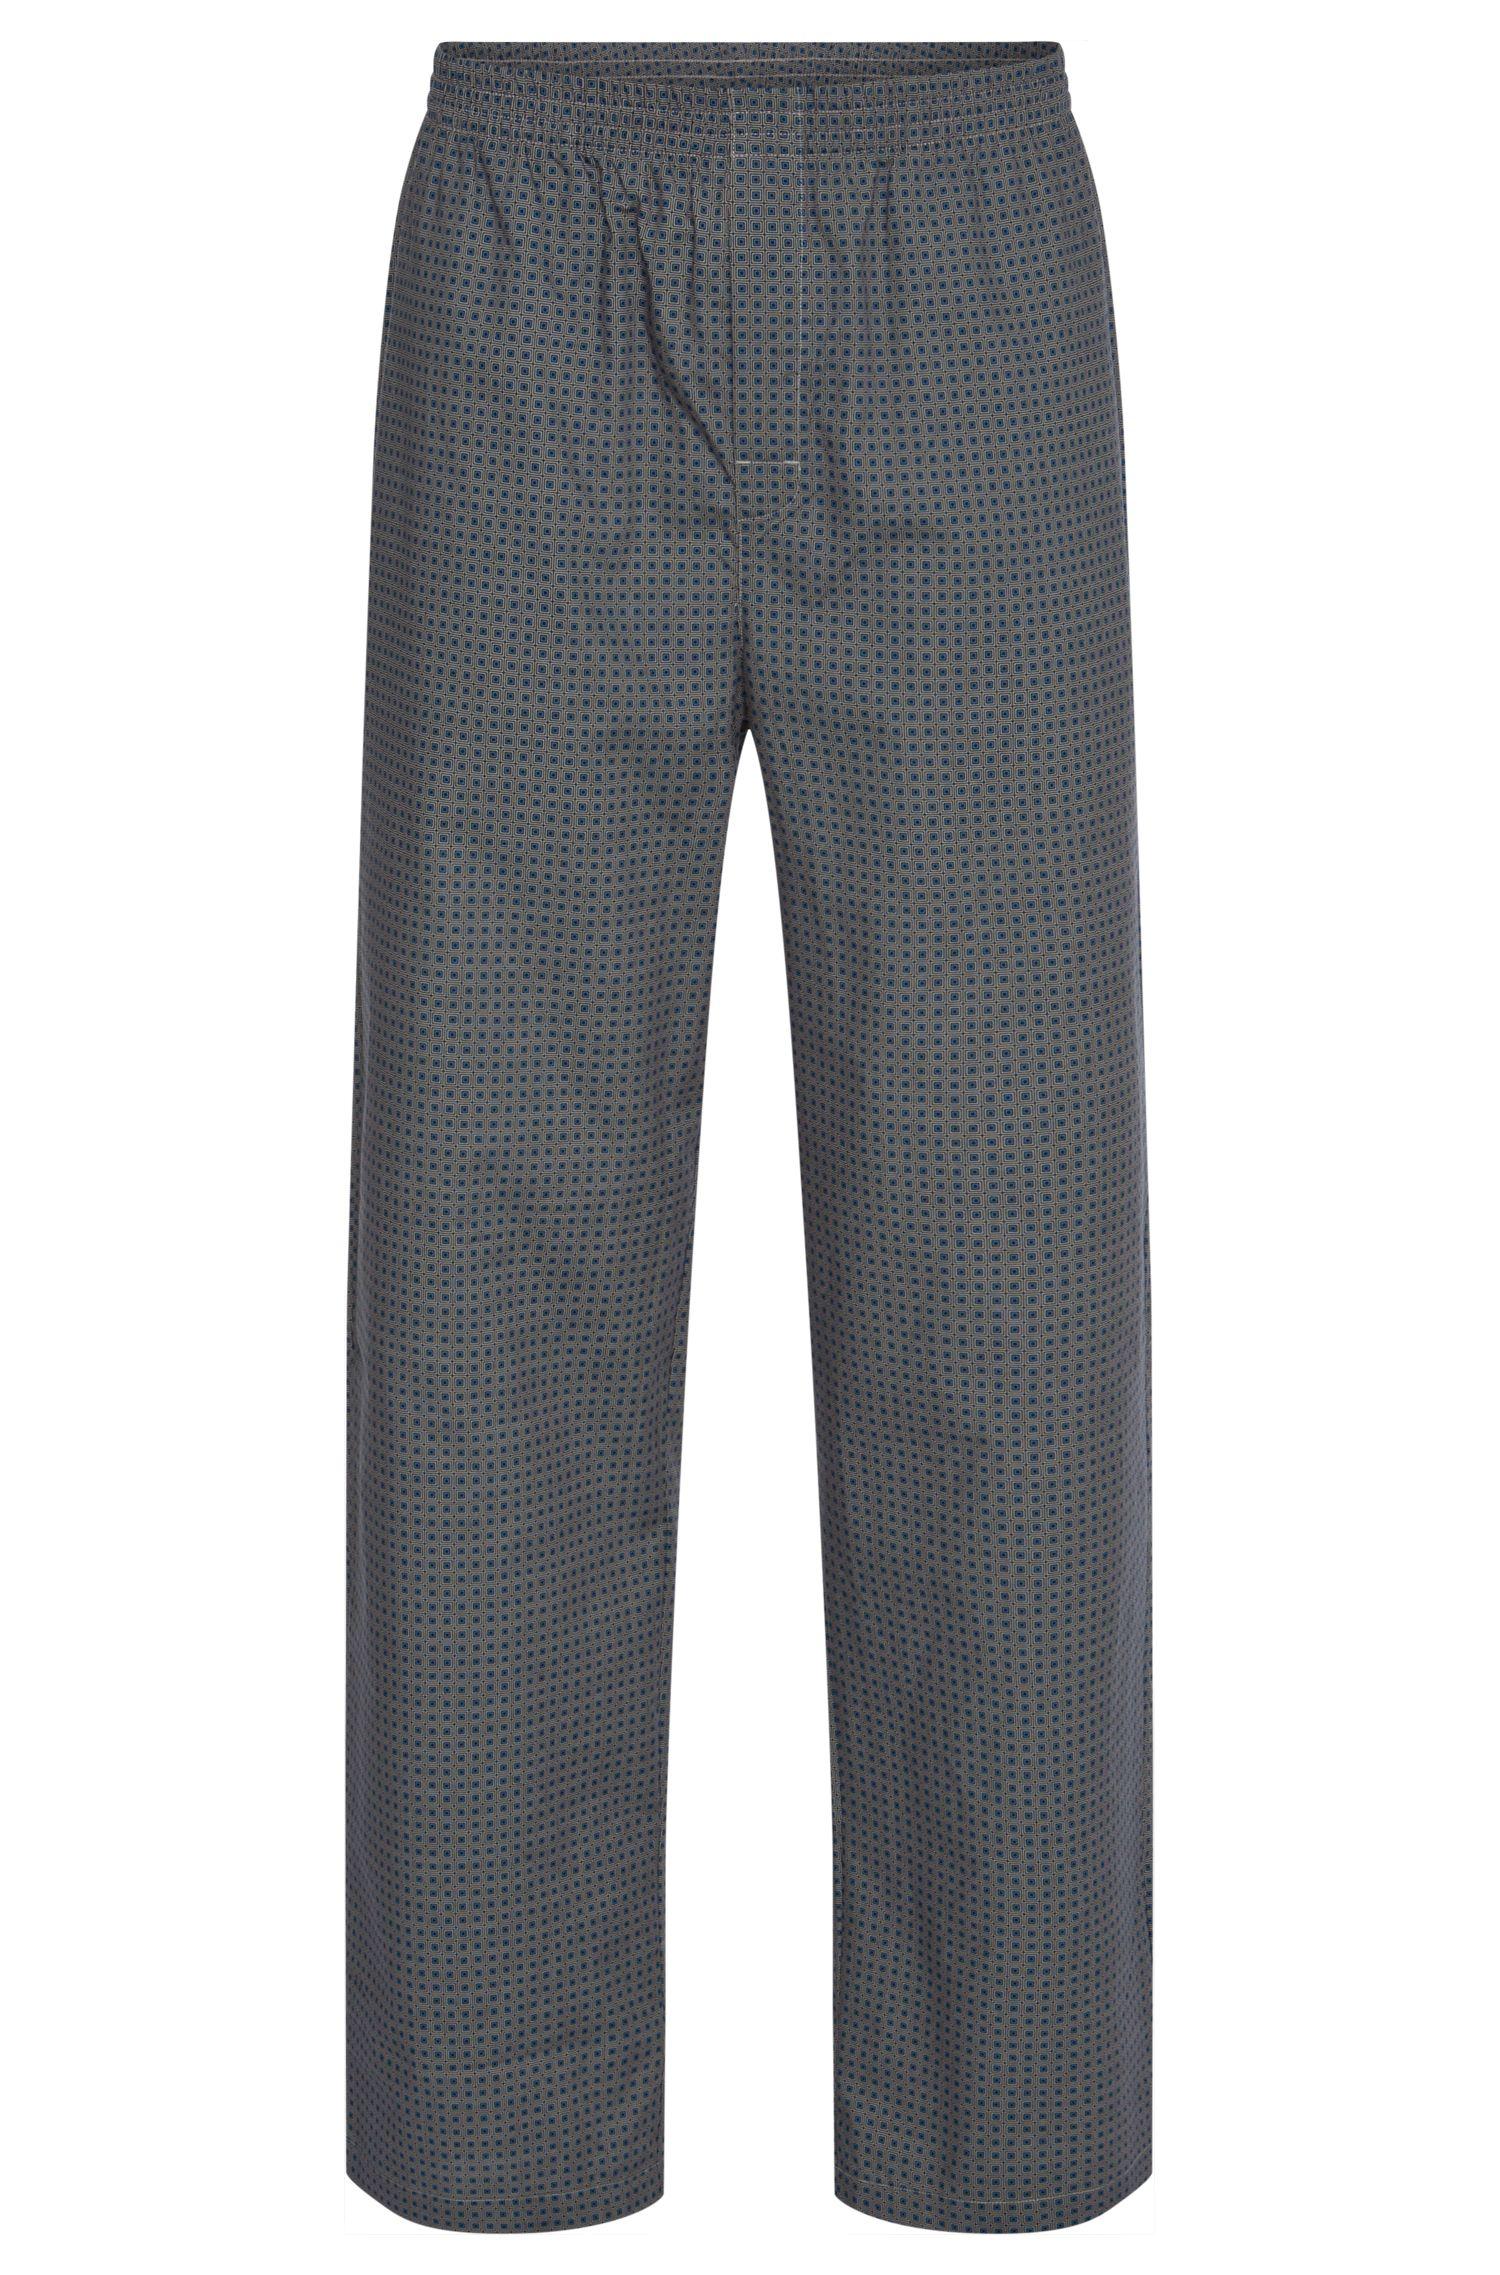 Allover gemusterte Pyjama-Hose aus Baumwolle: 'Long Pant CW'